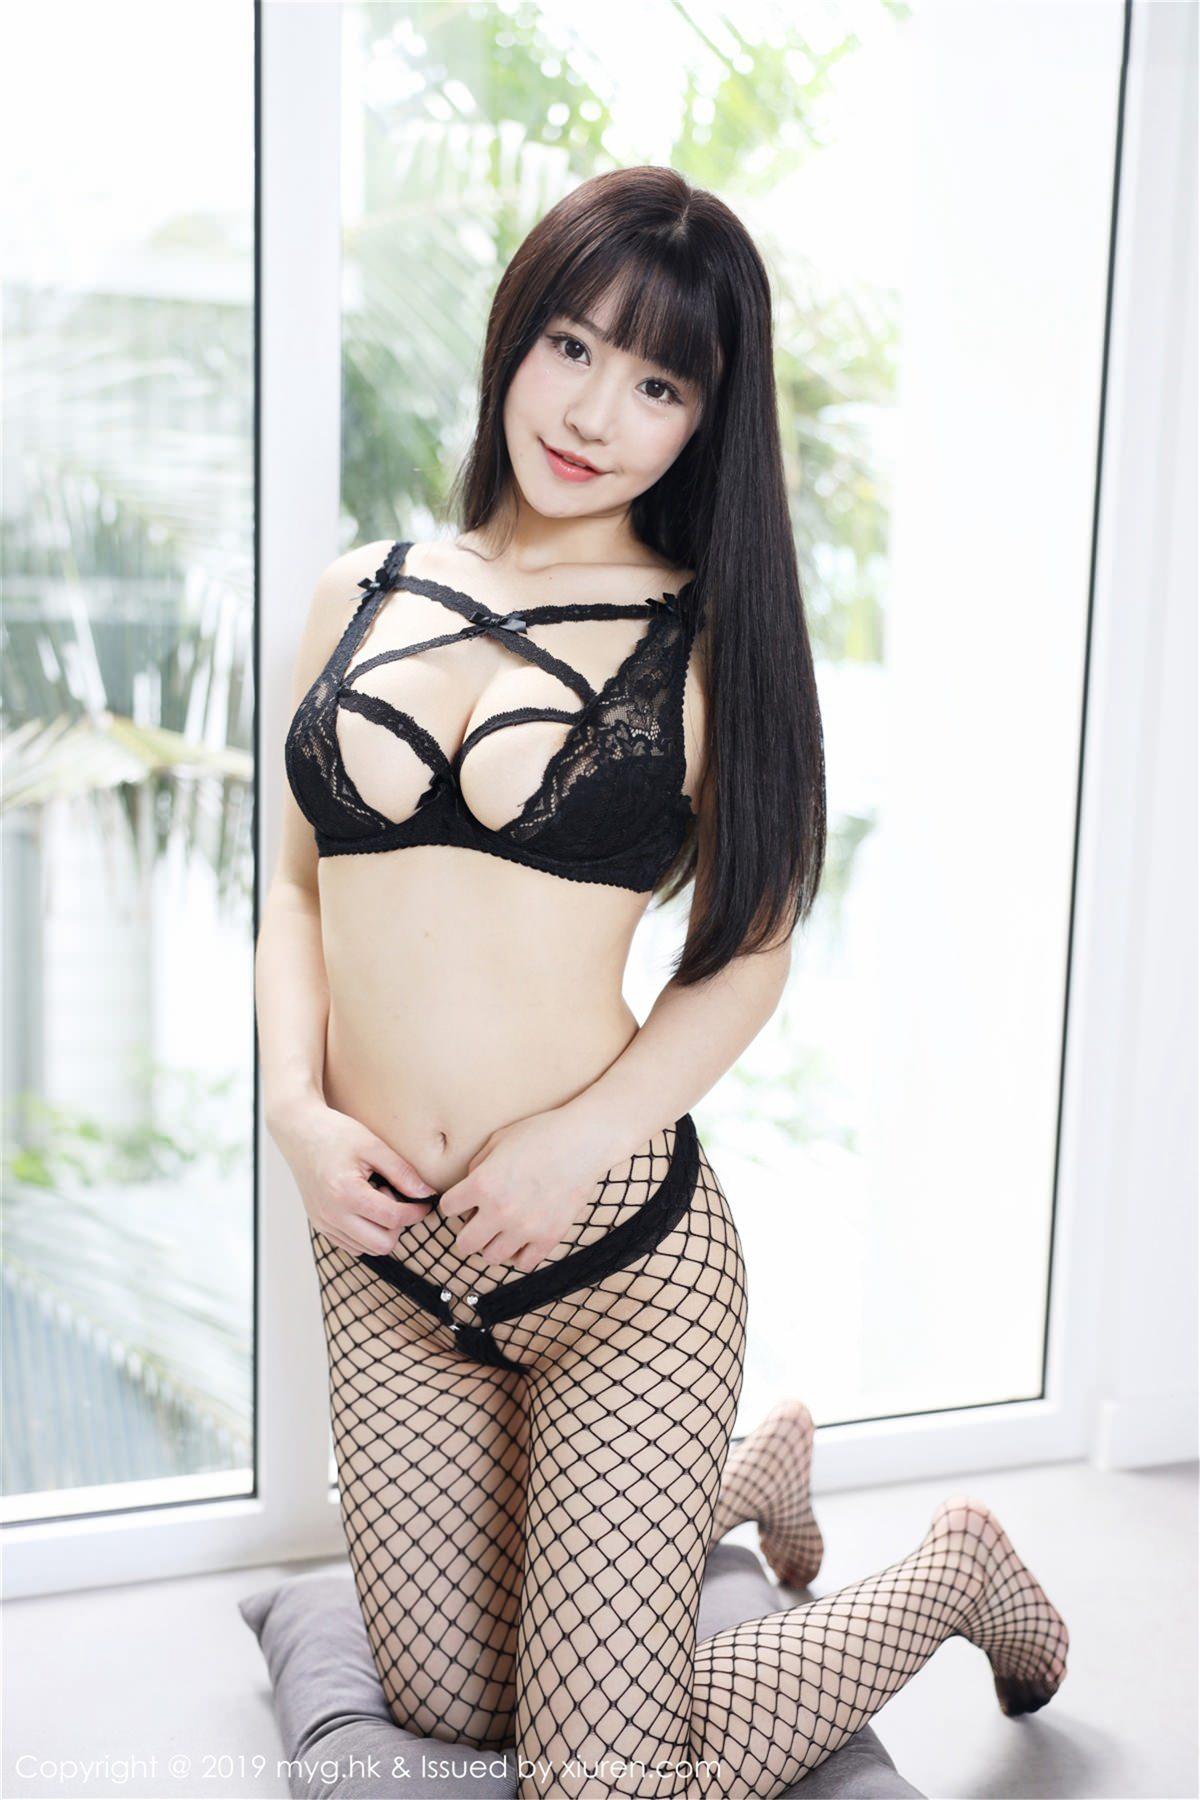 MyGirl Vol.357 7P, mygirl, Zhu Ke Er